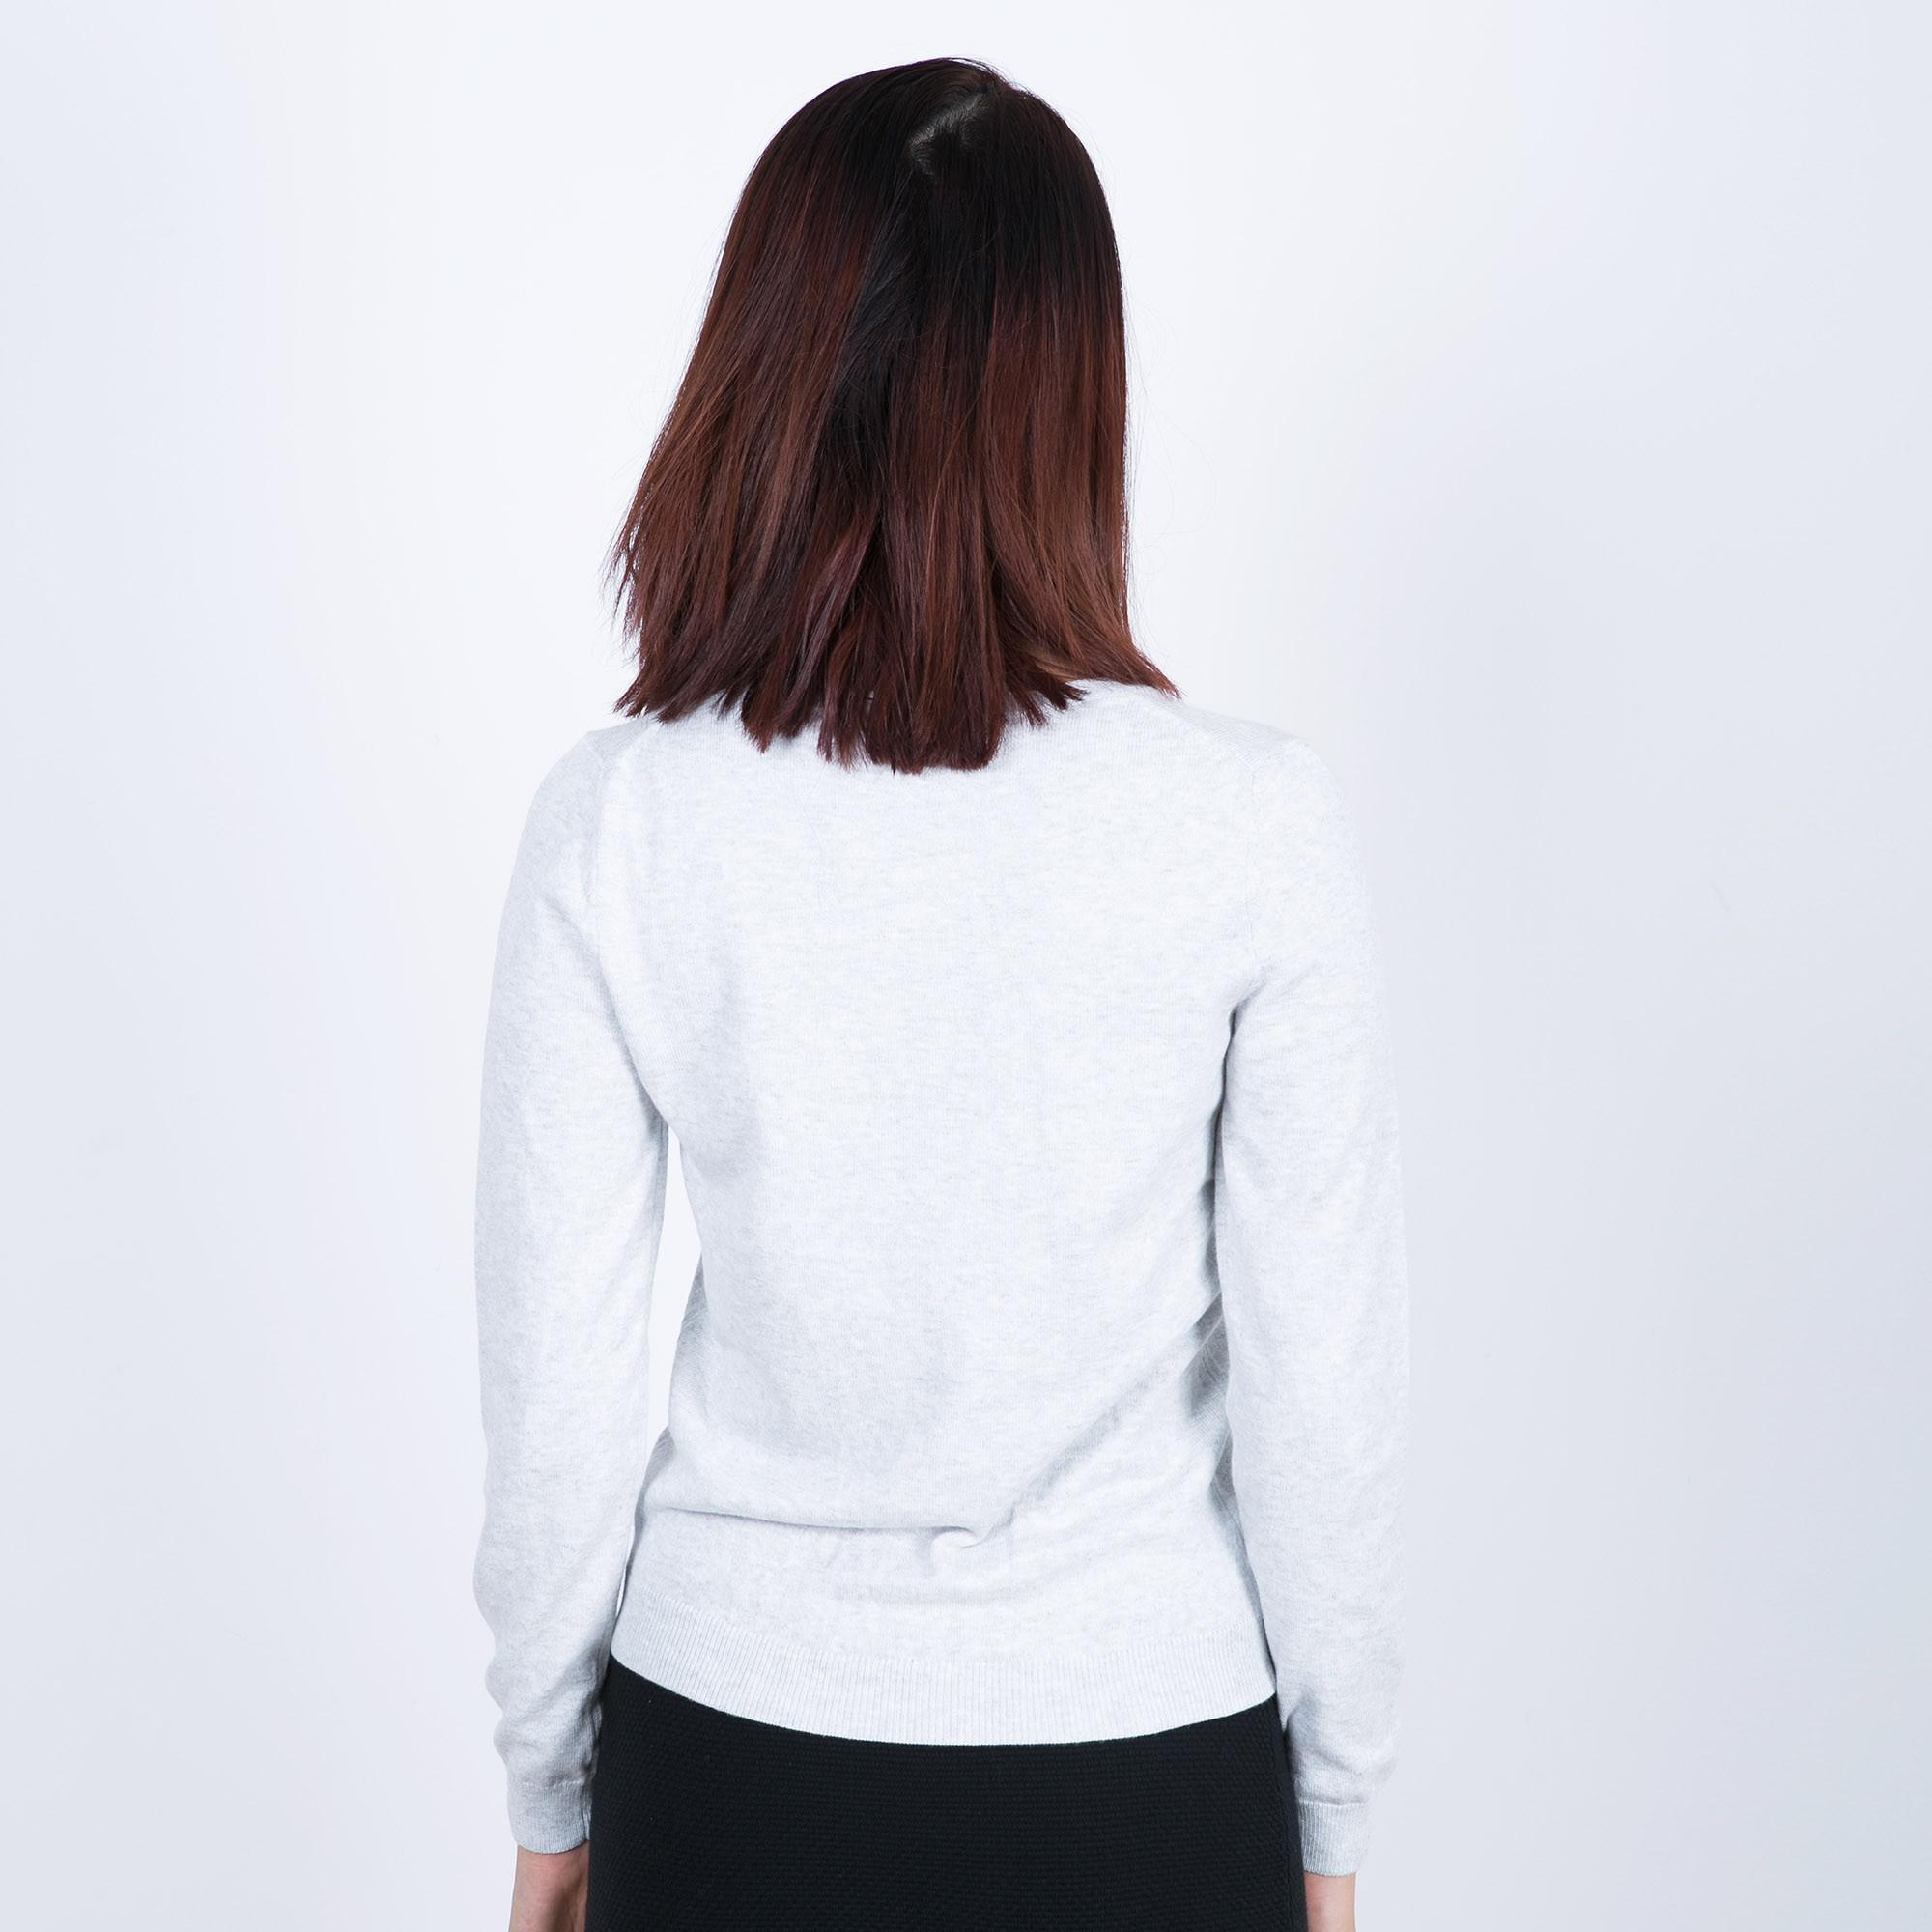 Áo len nữ cổ tròn